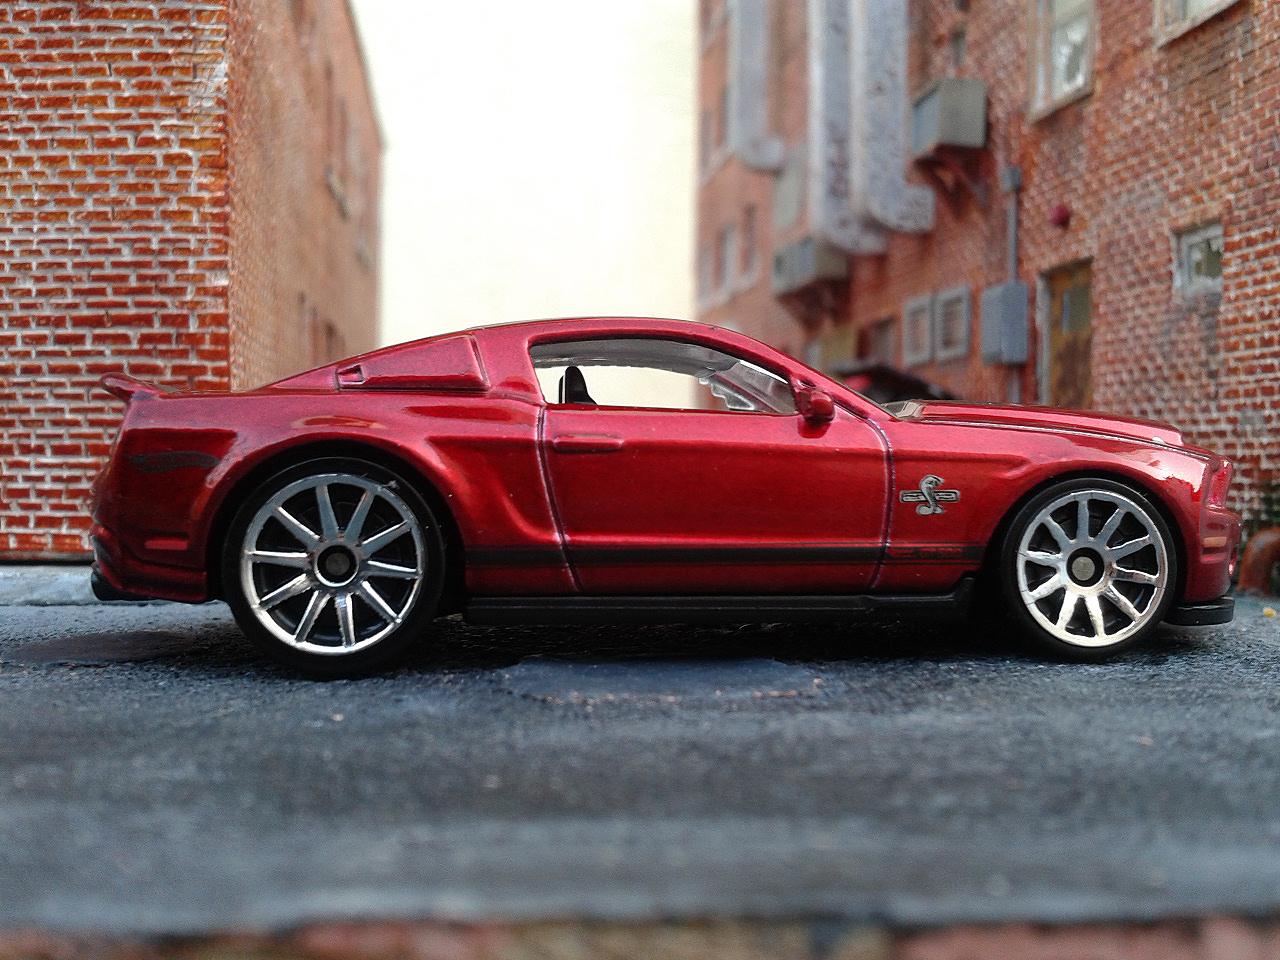 Diecast Cars Habitat: Ford Shelby 2010 GT-500 Super Snake